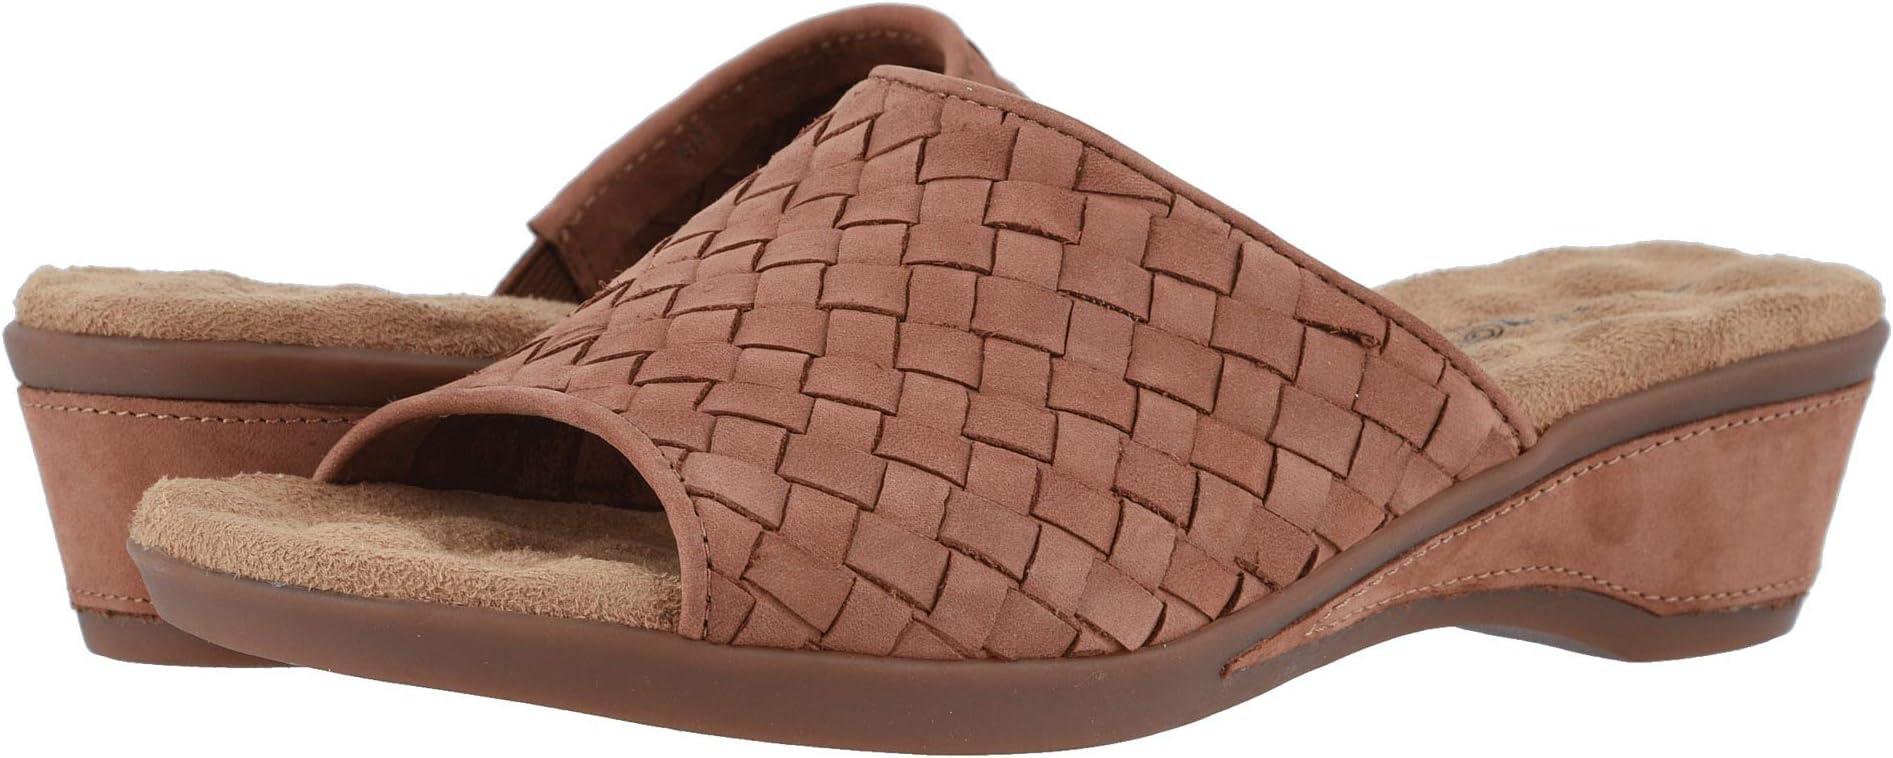 TC-1-Sandals-2020-03-30